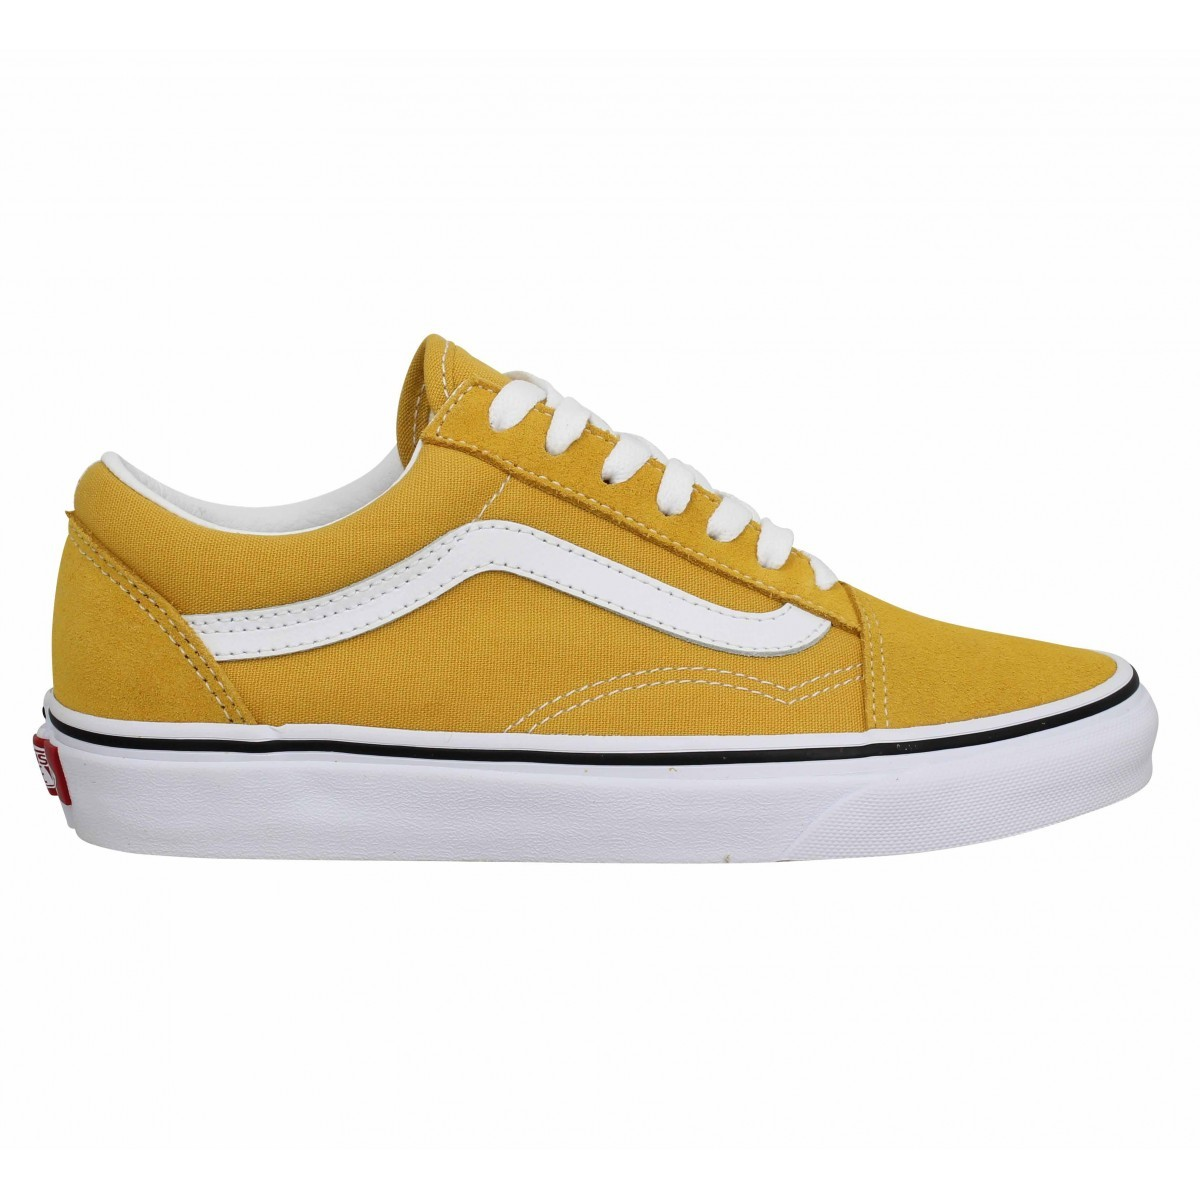 chaussure vans jaune femme